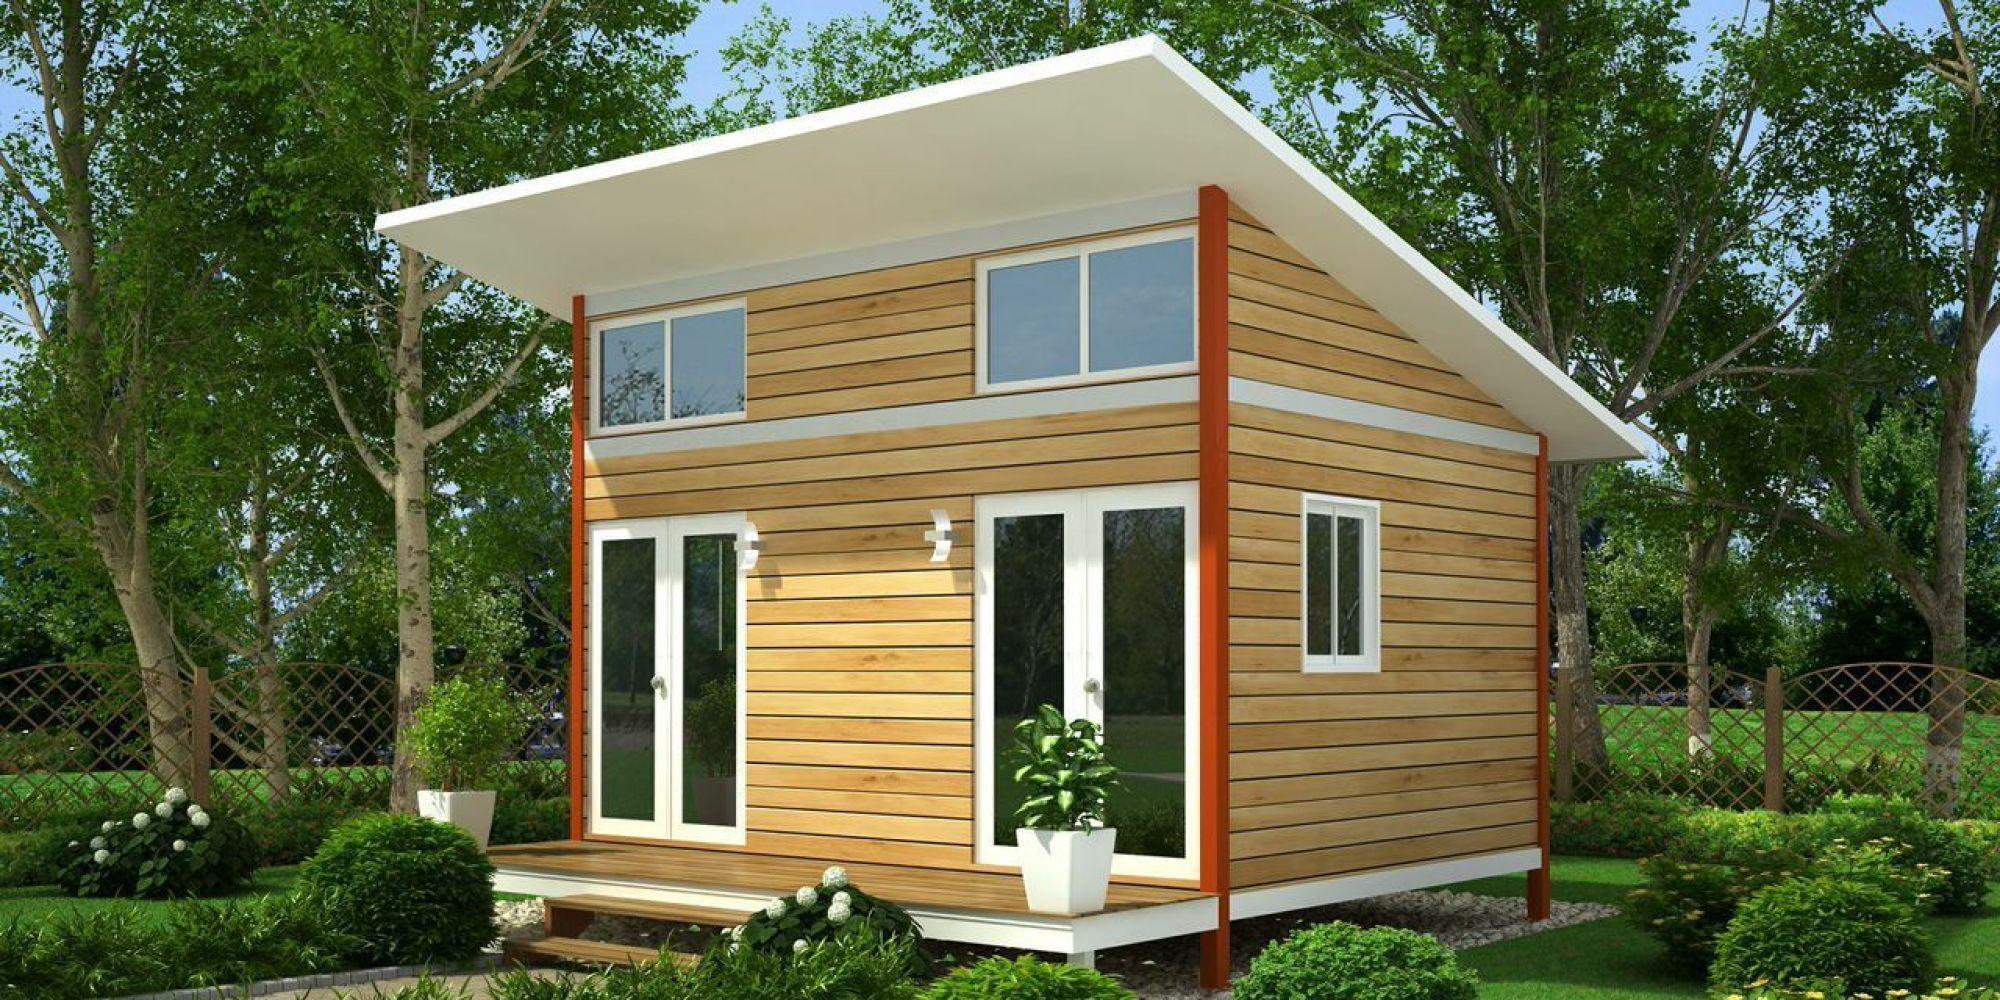 Small Home Plans With Finished Basement Smallhouseplans Tiny House Village Tiny House Community Tiny House Design